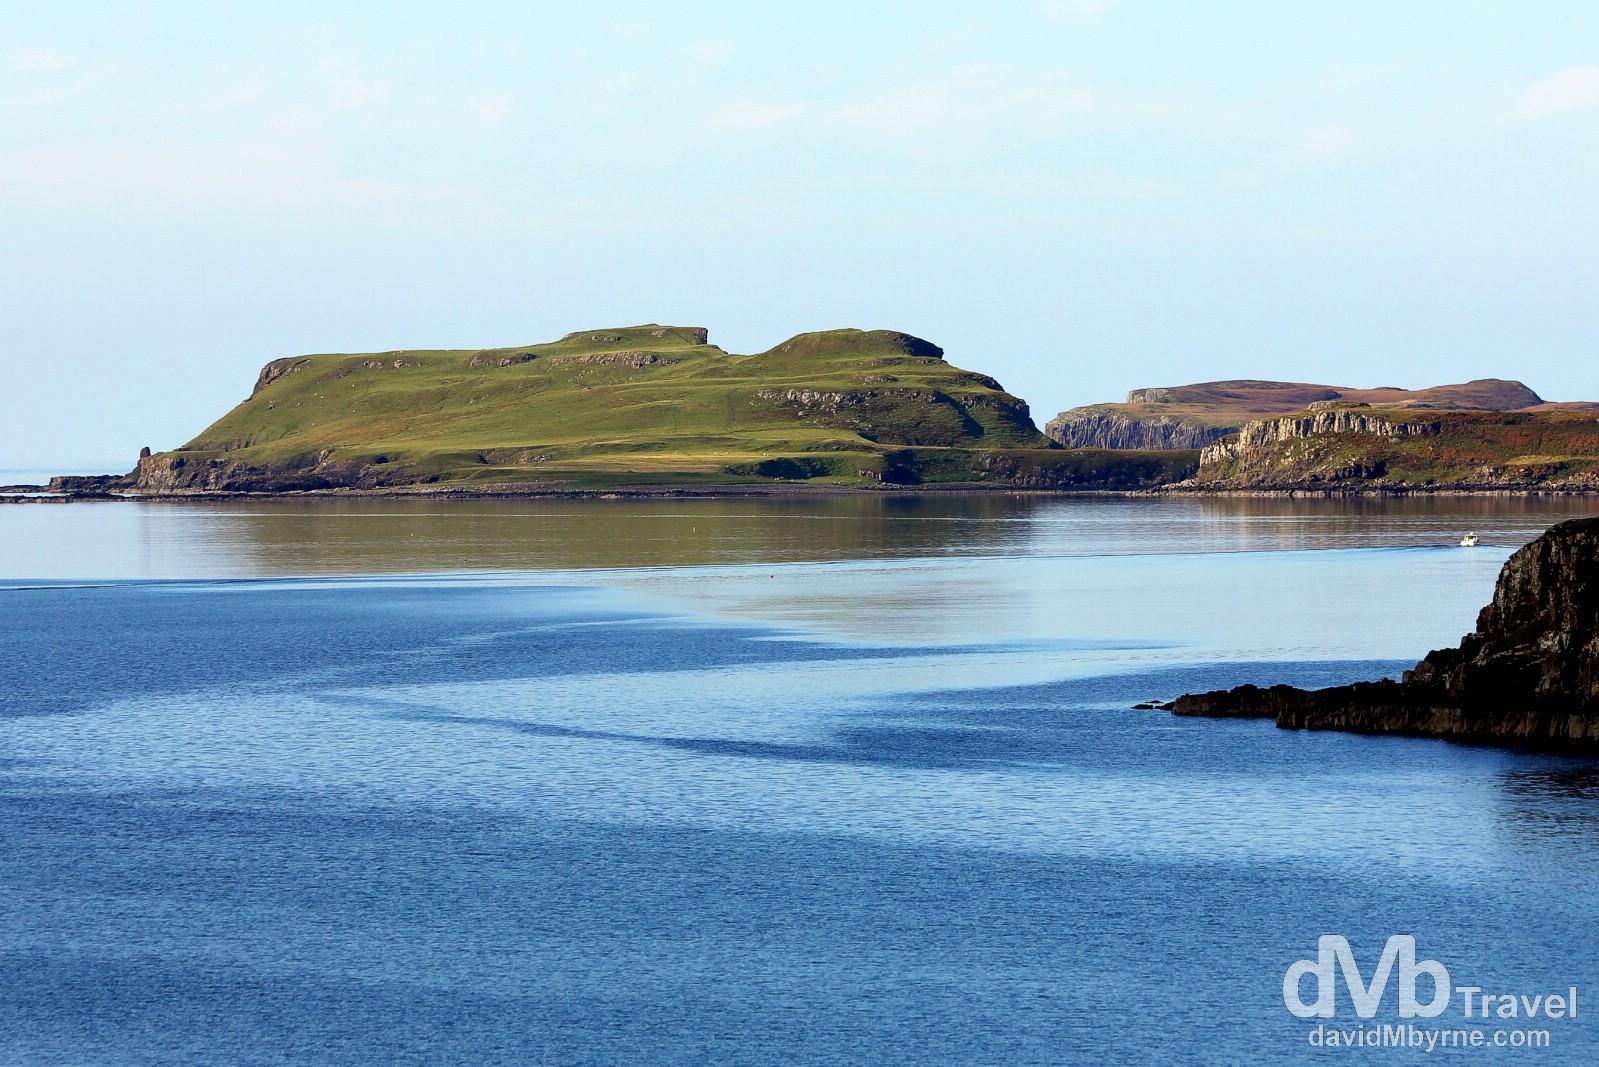 Coastal scenery at Loch Harport on the Isle of Skye, Scotland. September 17, 2014.